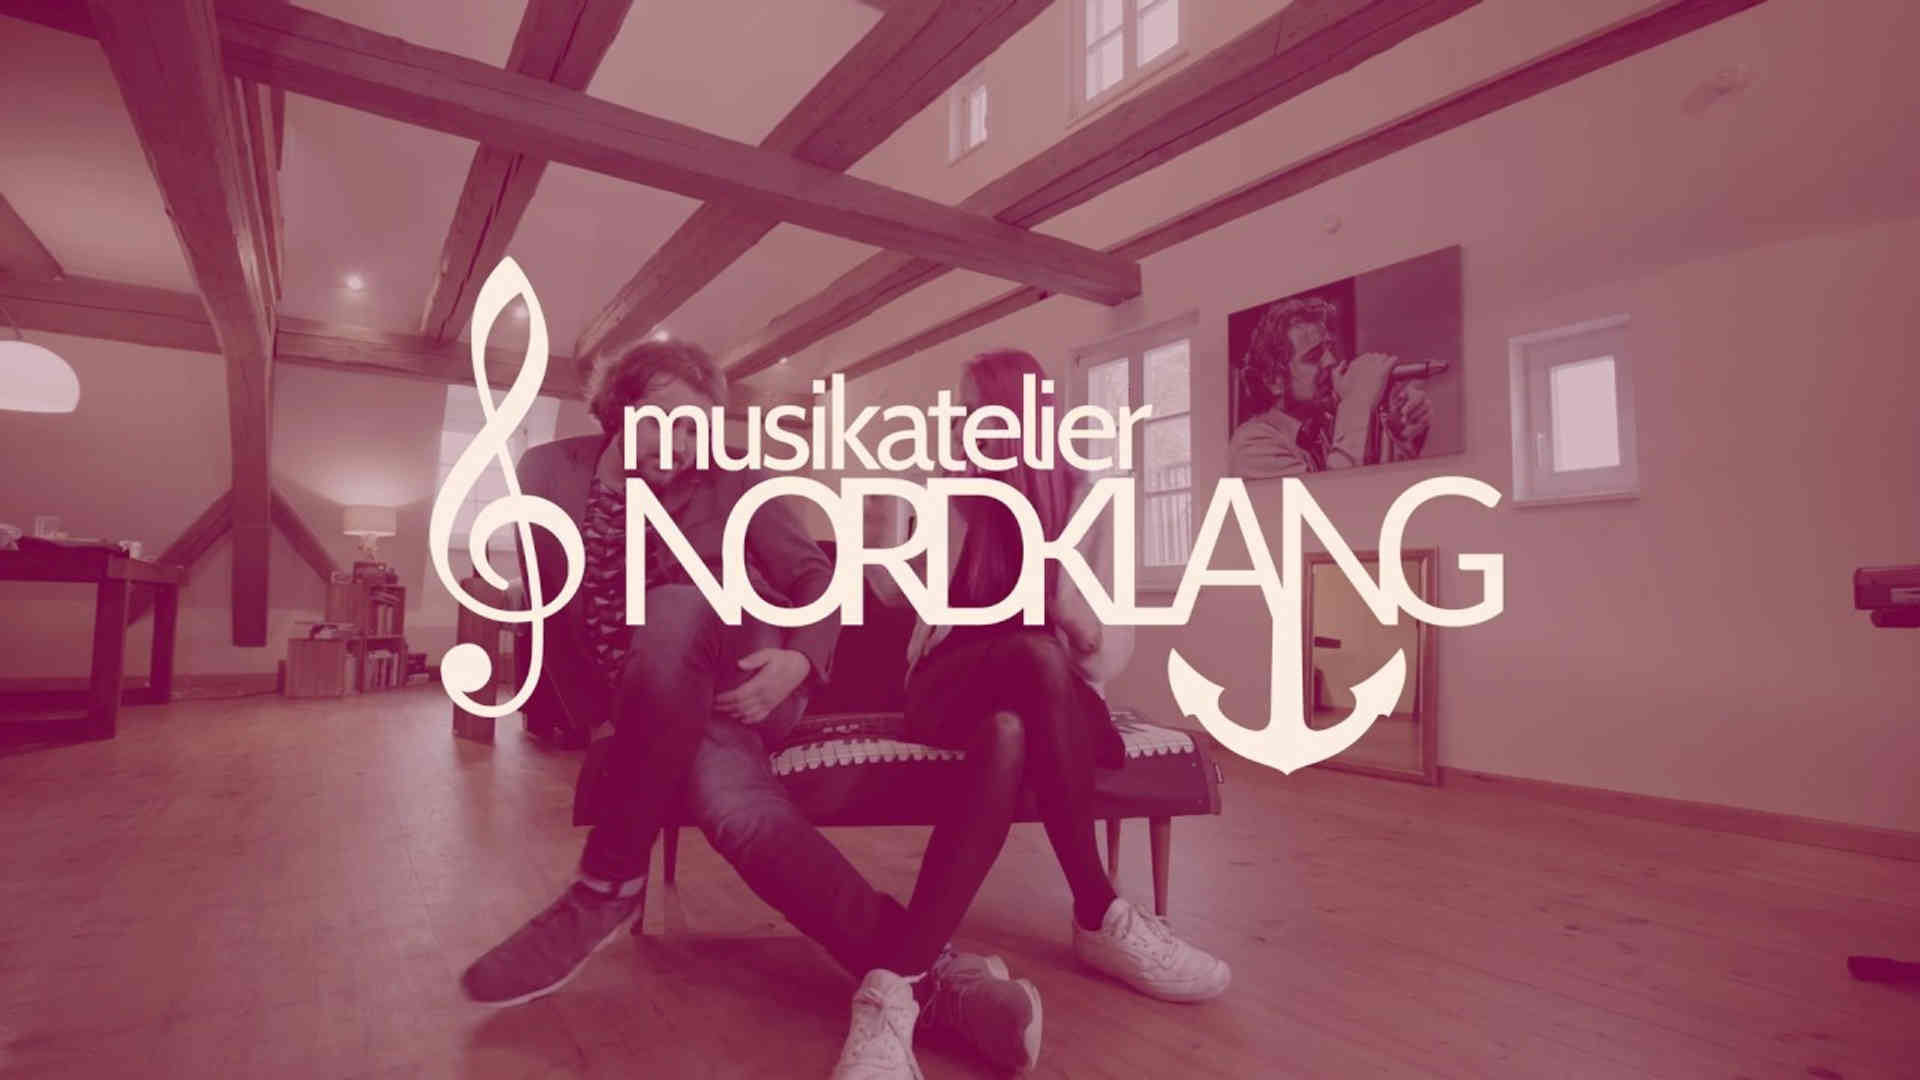 Musikatelier Nordklang